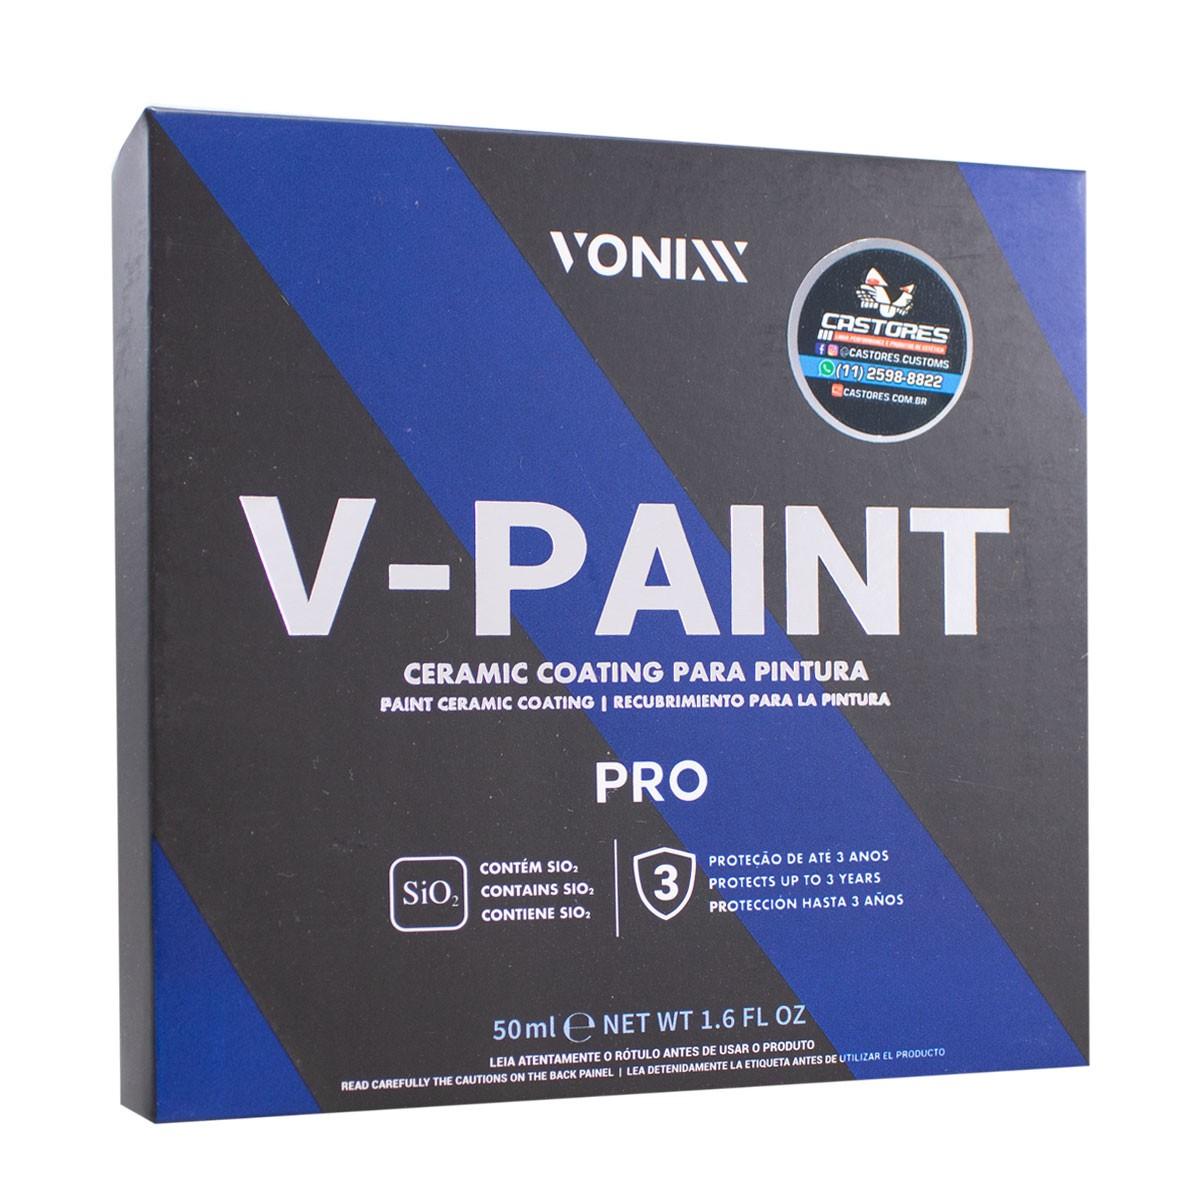 V-paint Vitrificador De Pintura Vonixx 50ml